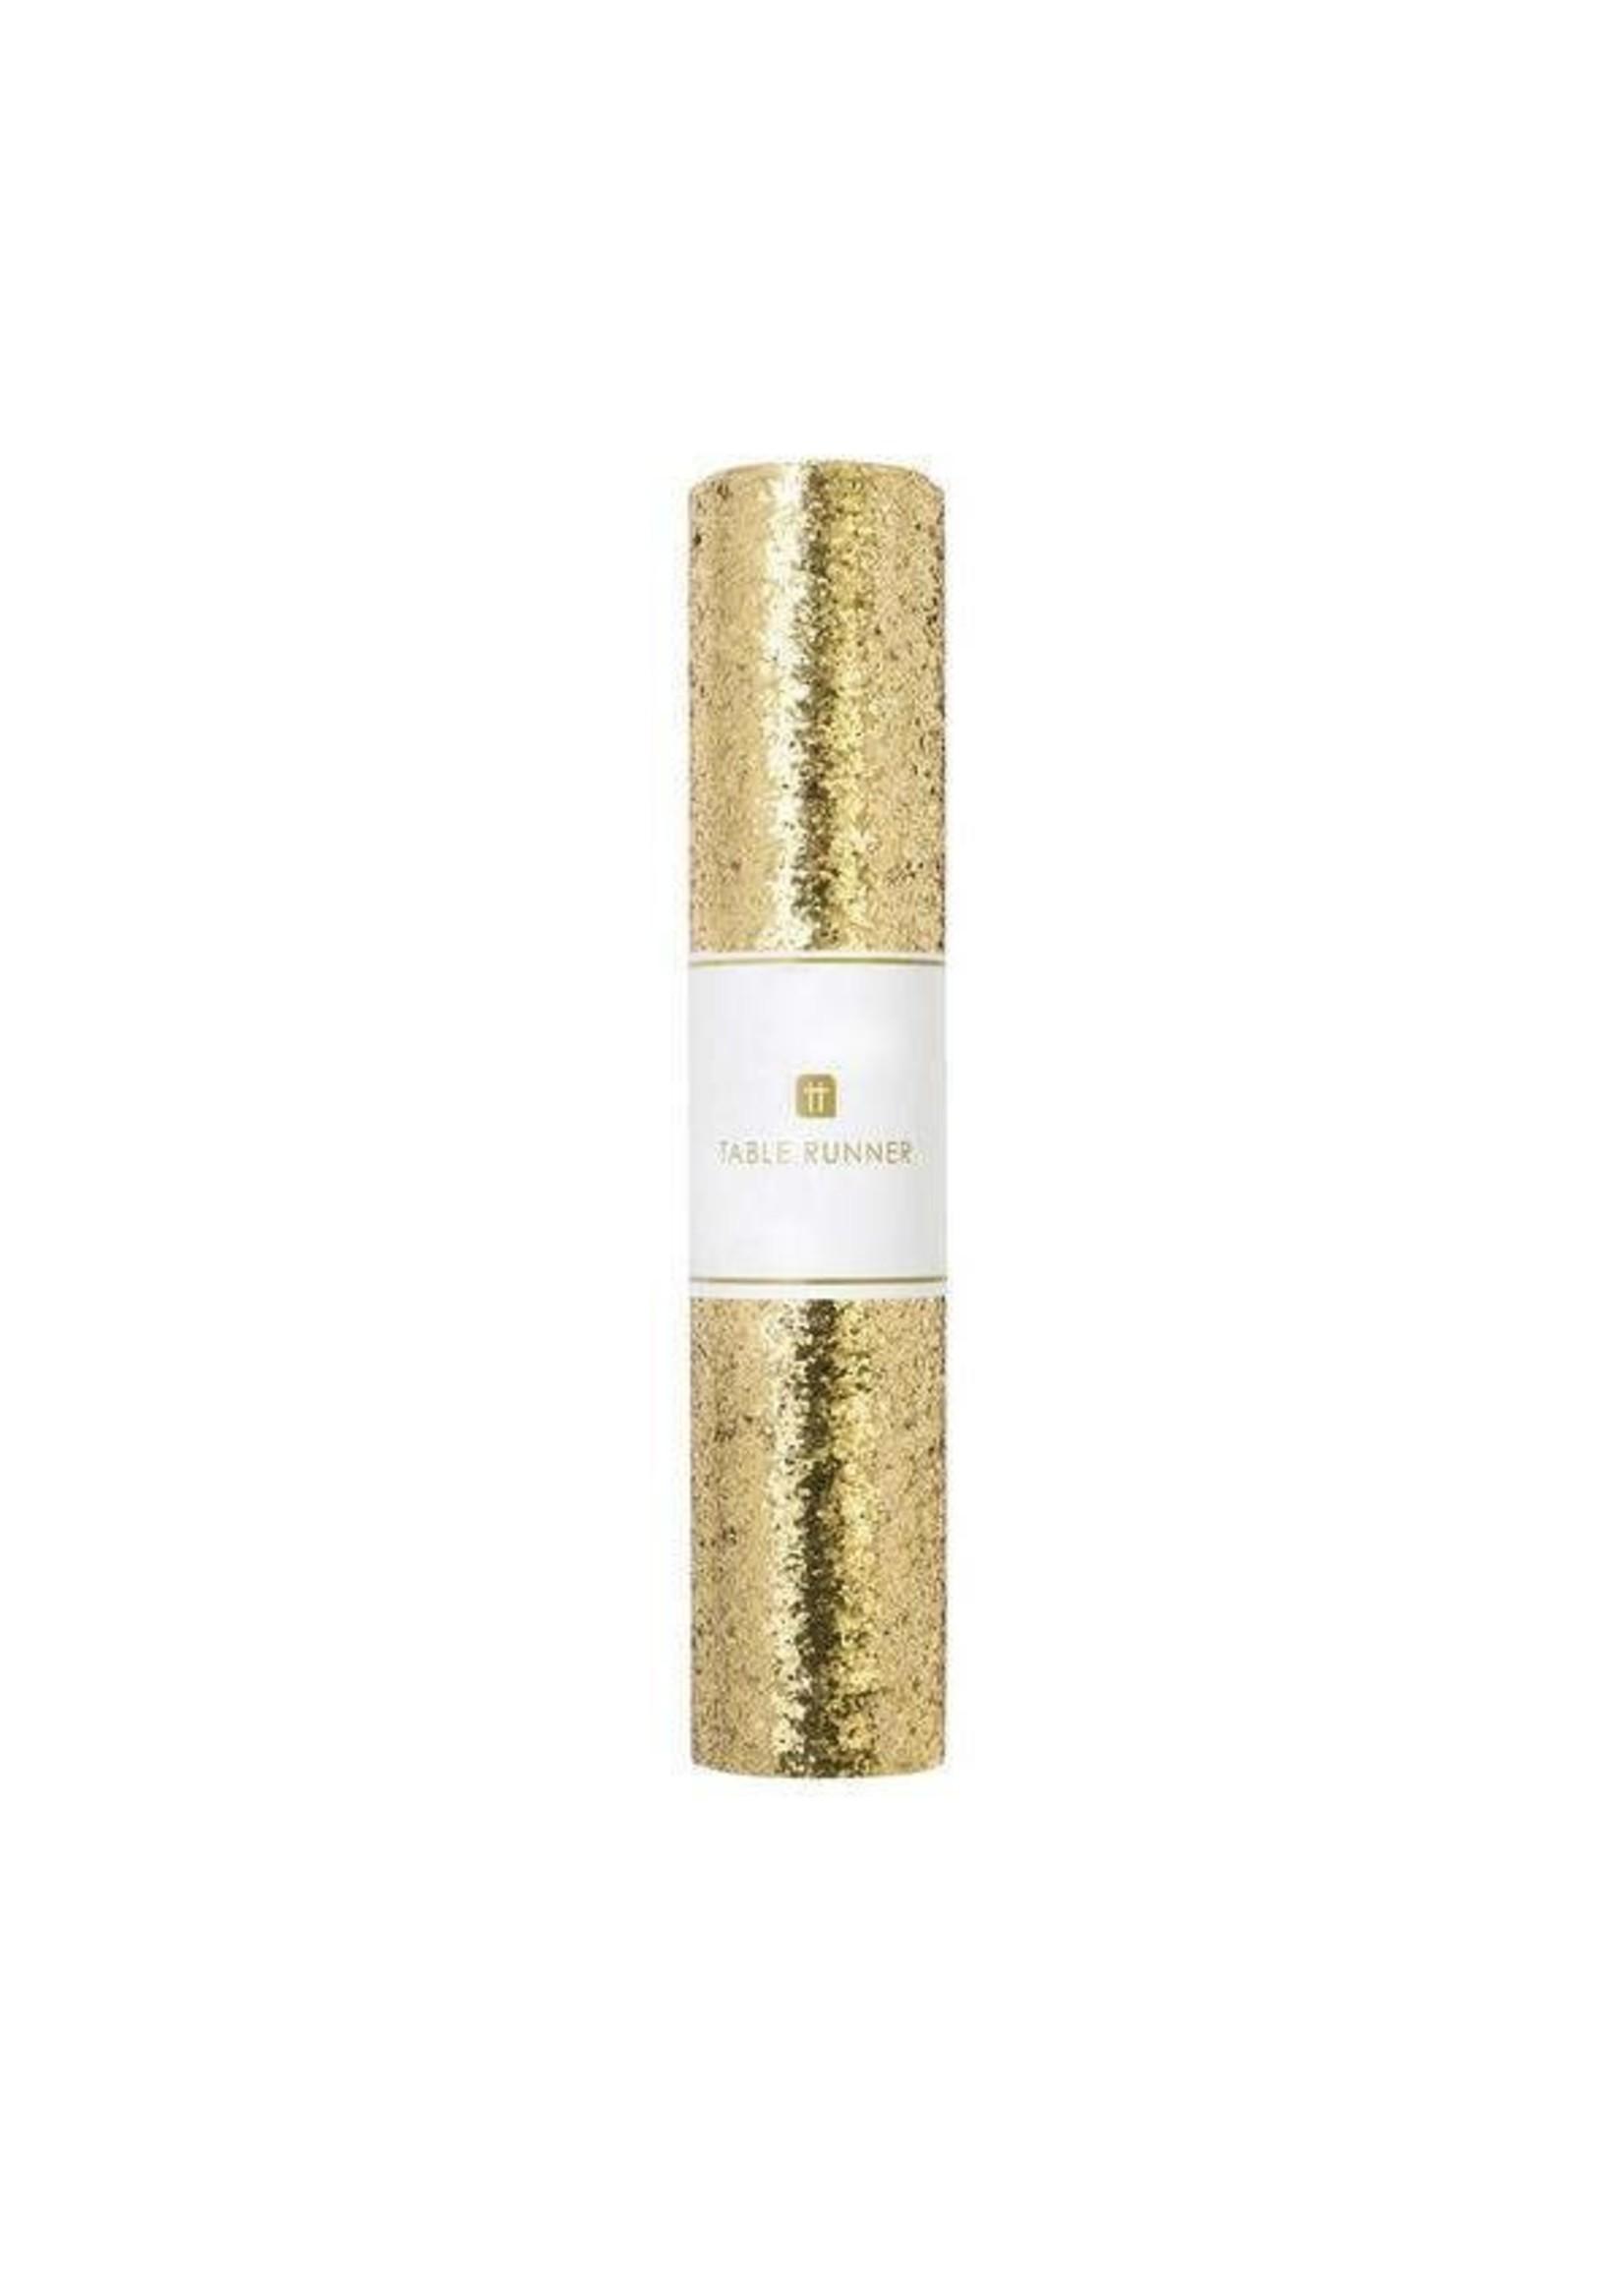 Luxe Gold Glitter Runner